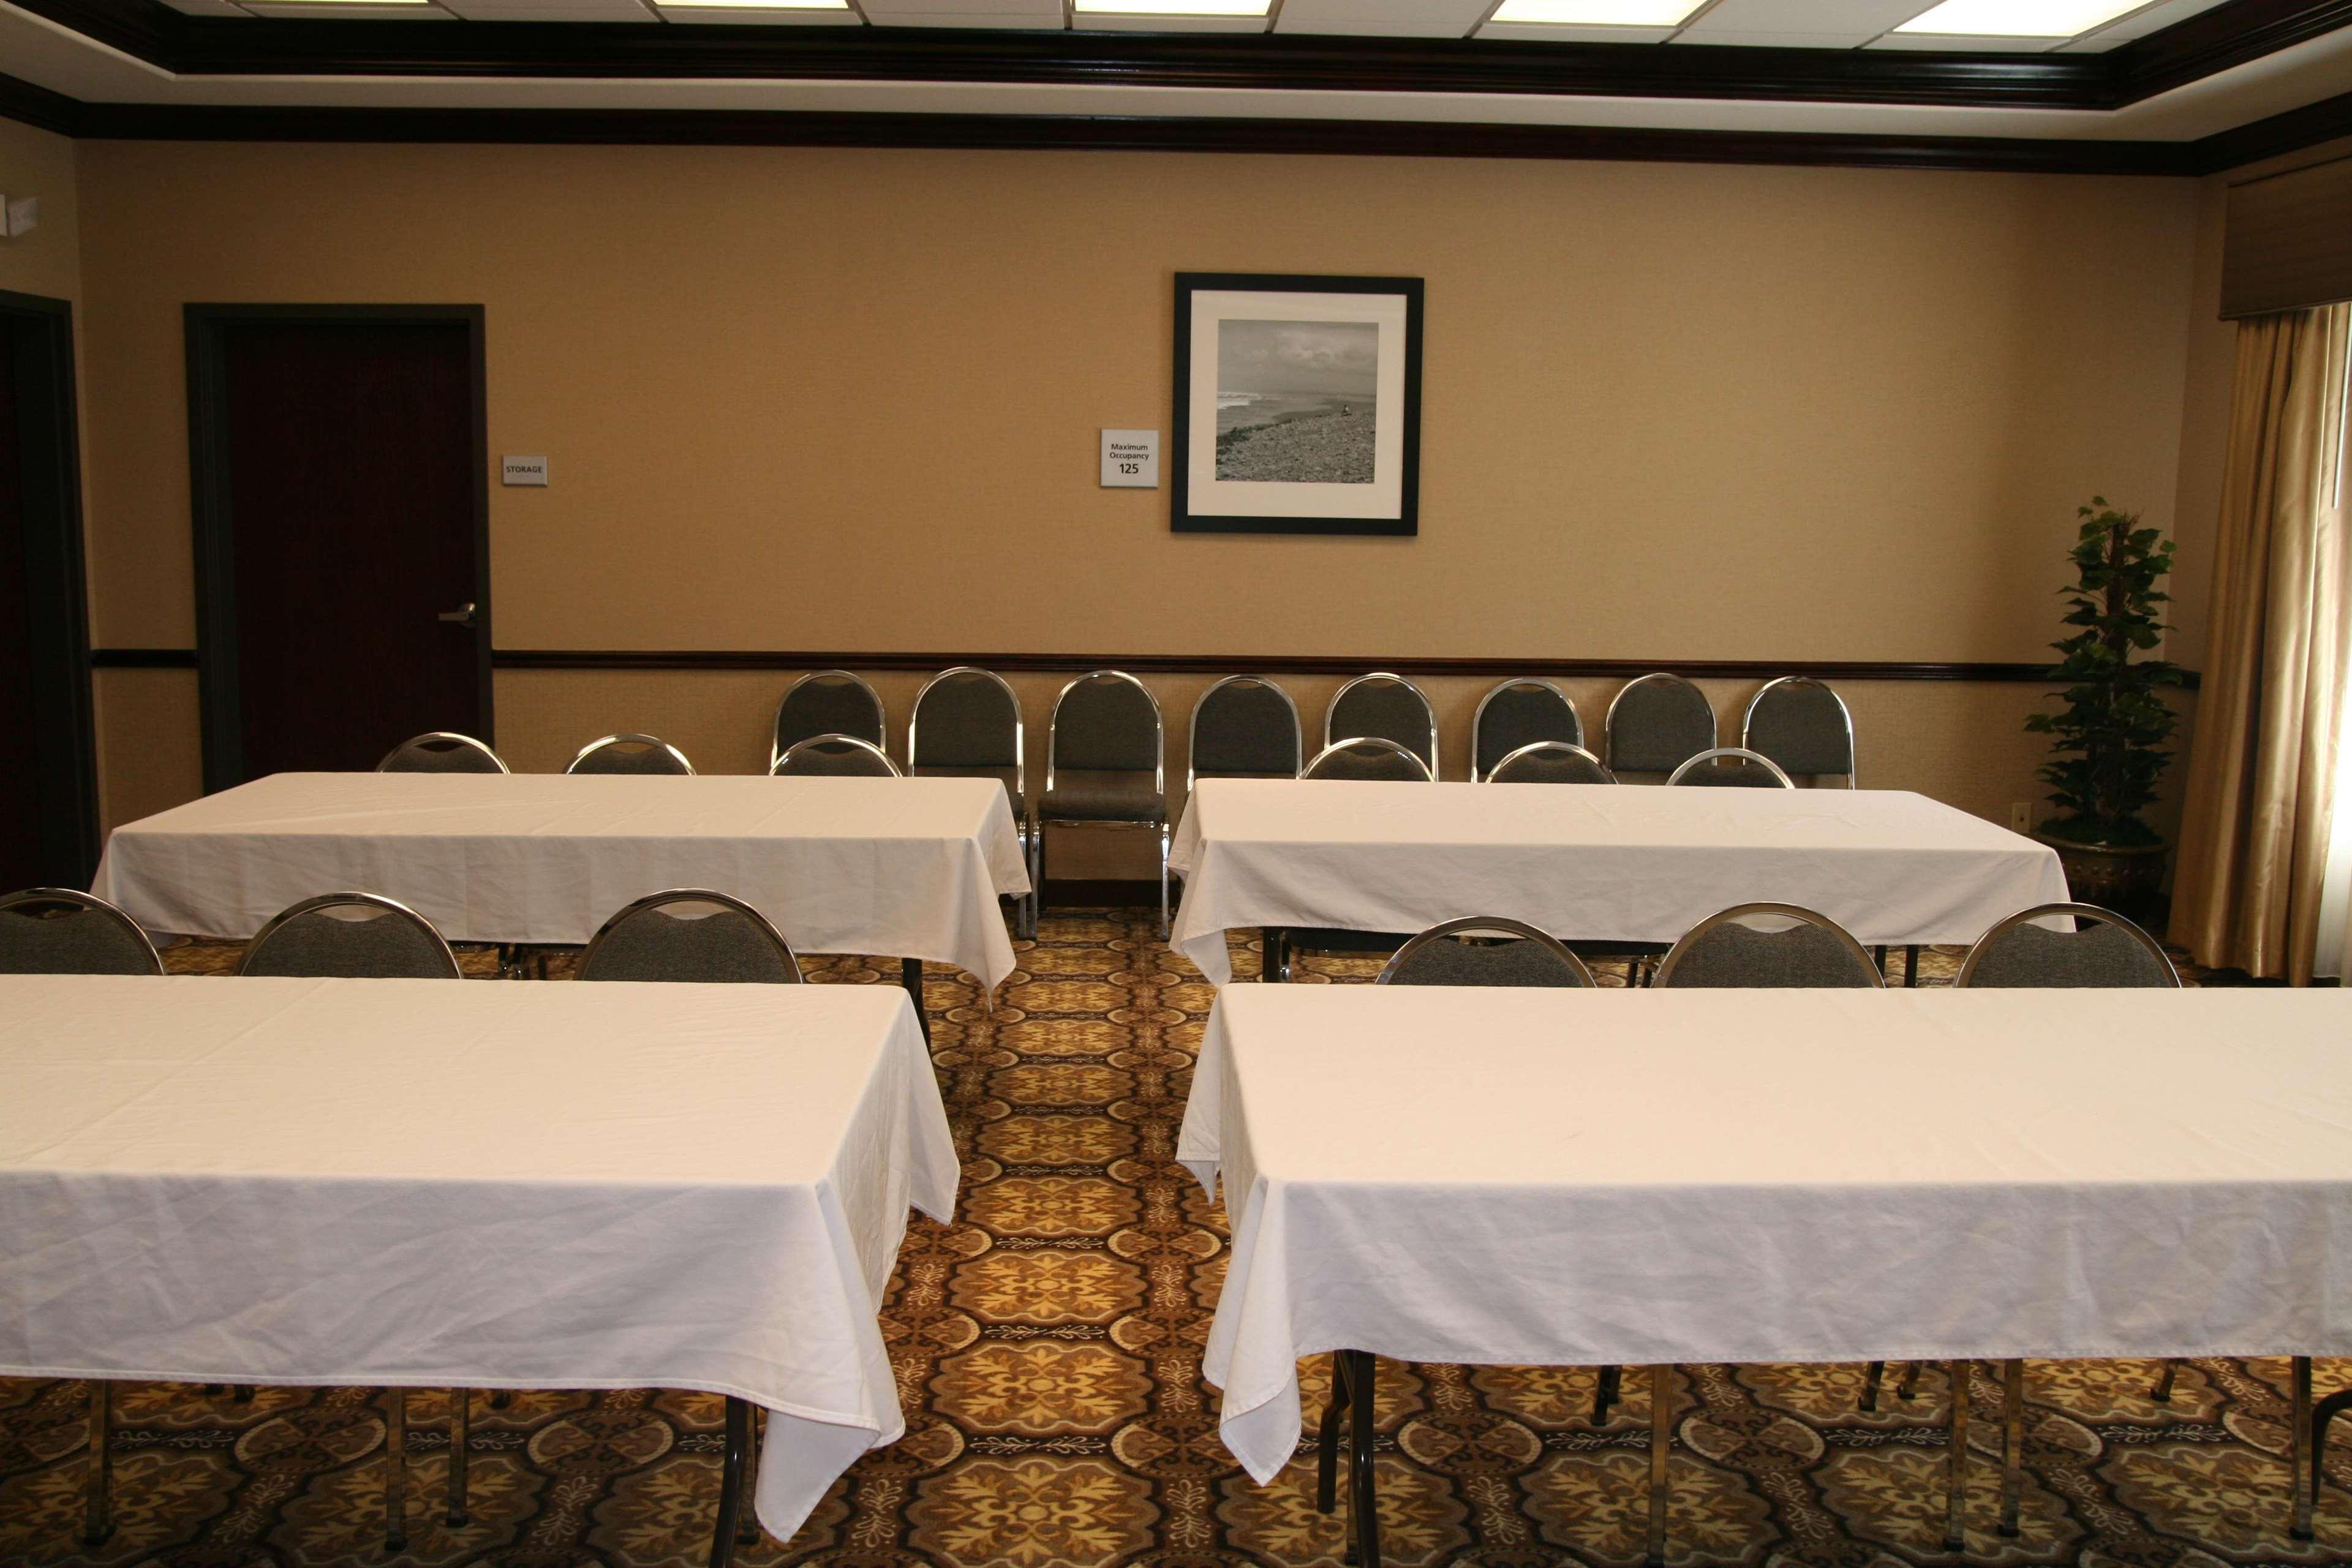 Hampton Inn & Suites Galveston image 33